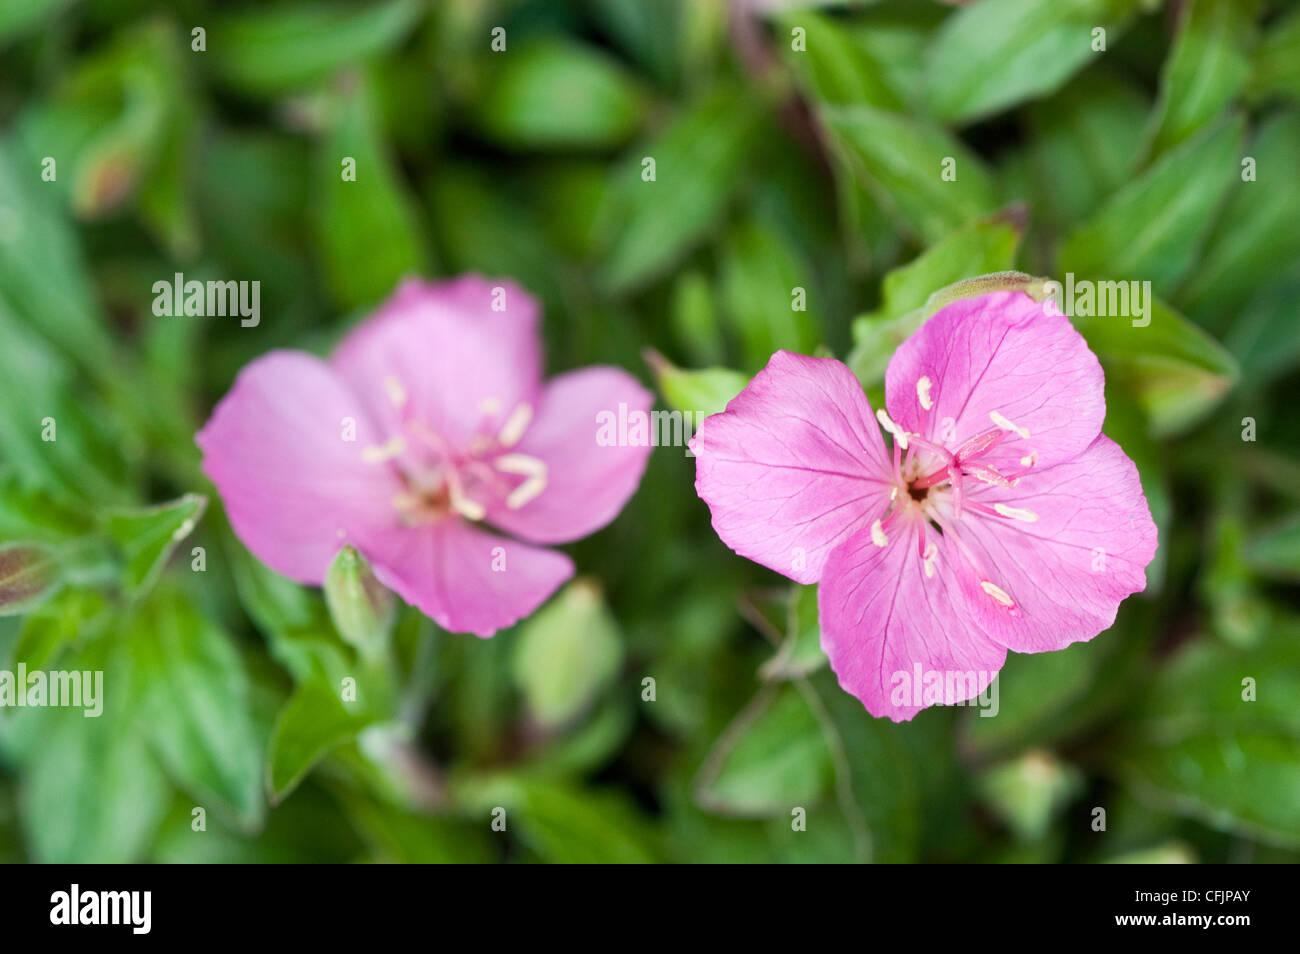 Pink magenta flowers of Oenothera Glowing Magenta Stock Photo